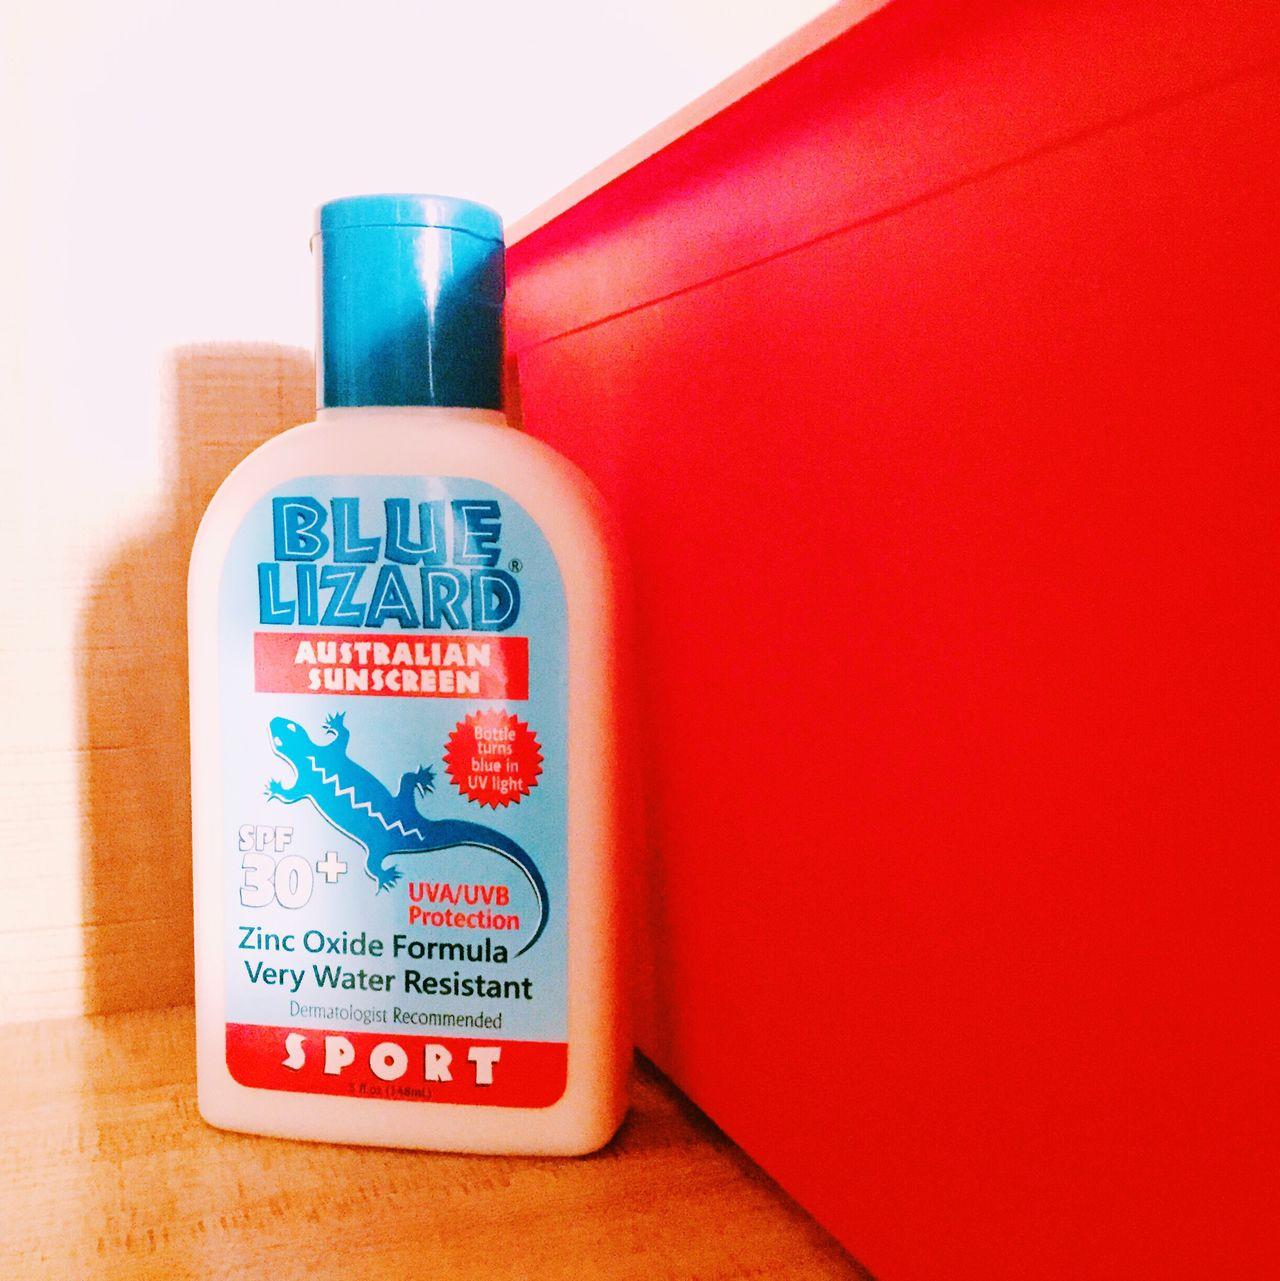 Blue Lizard Sun Cream Commodity Red Gecko Australia Cute Blue